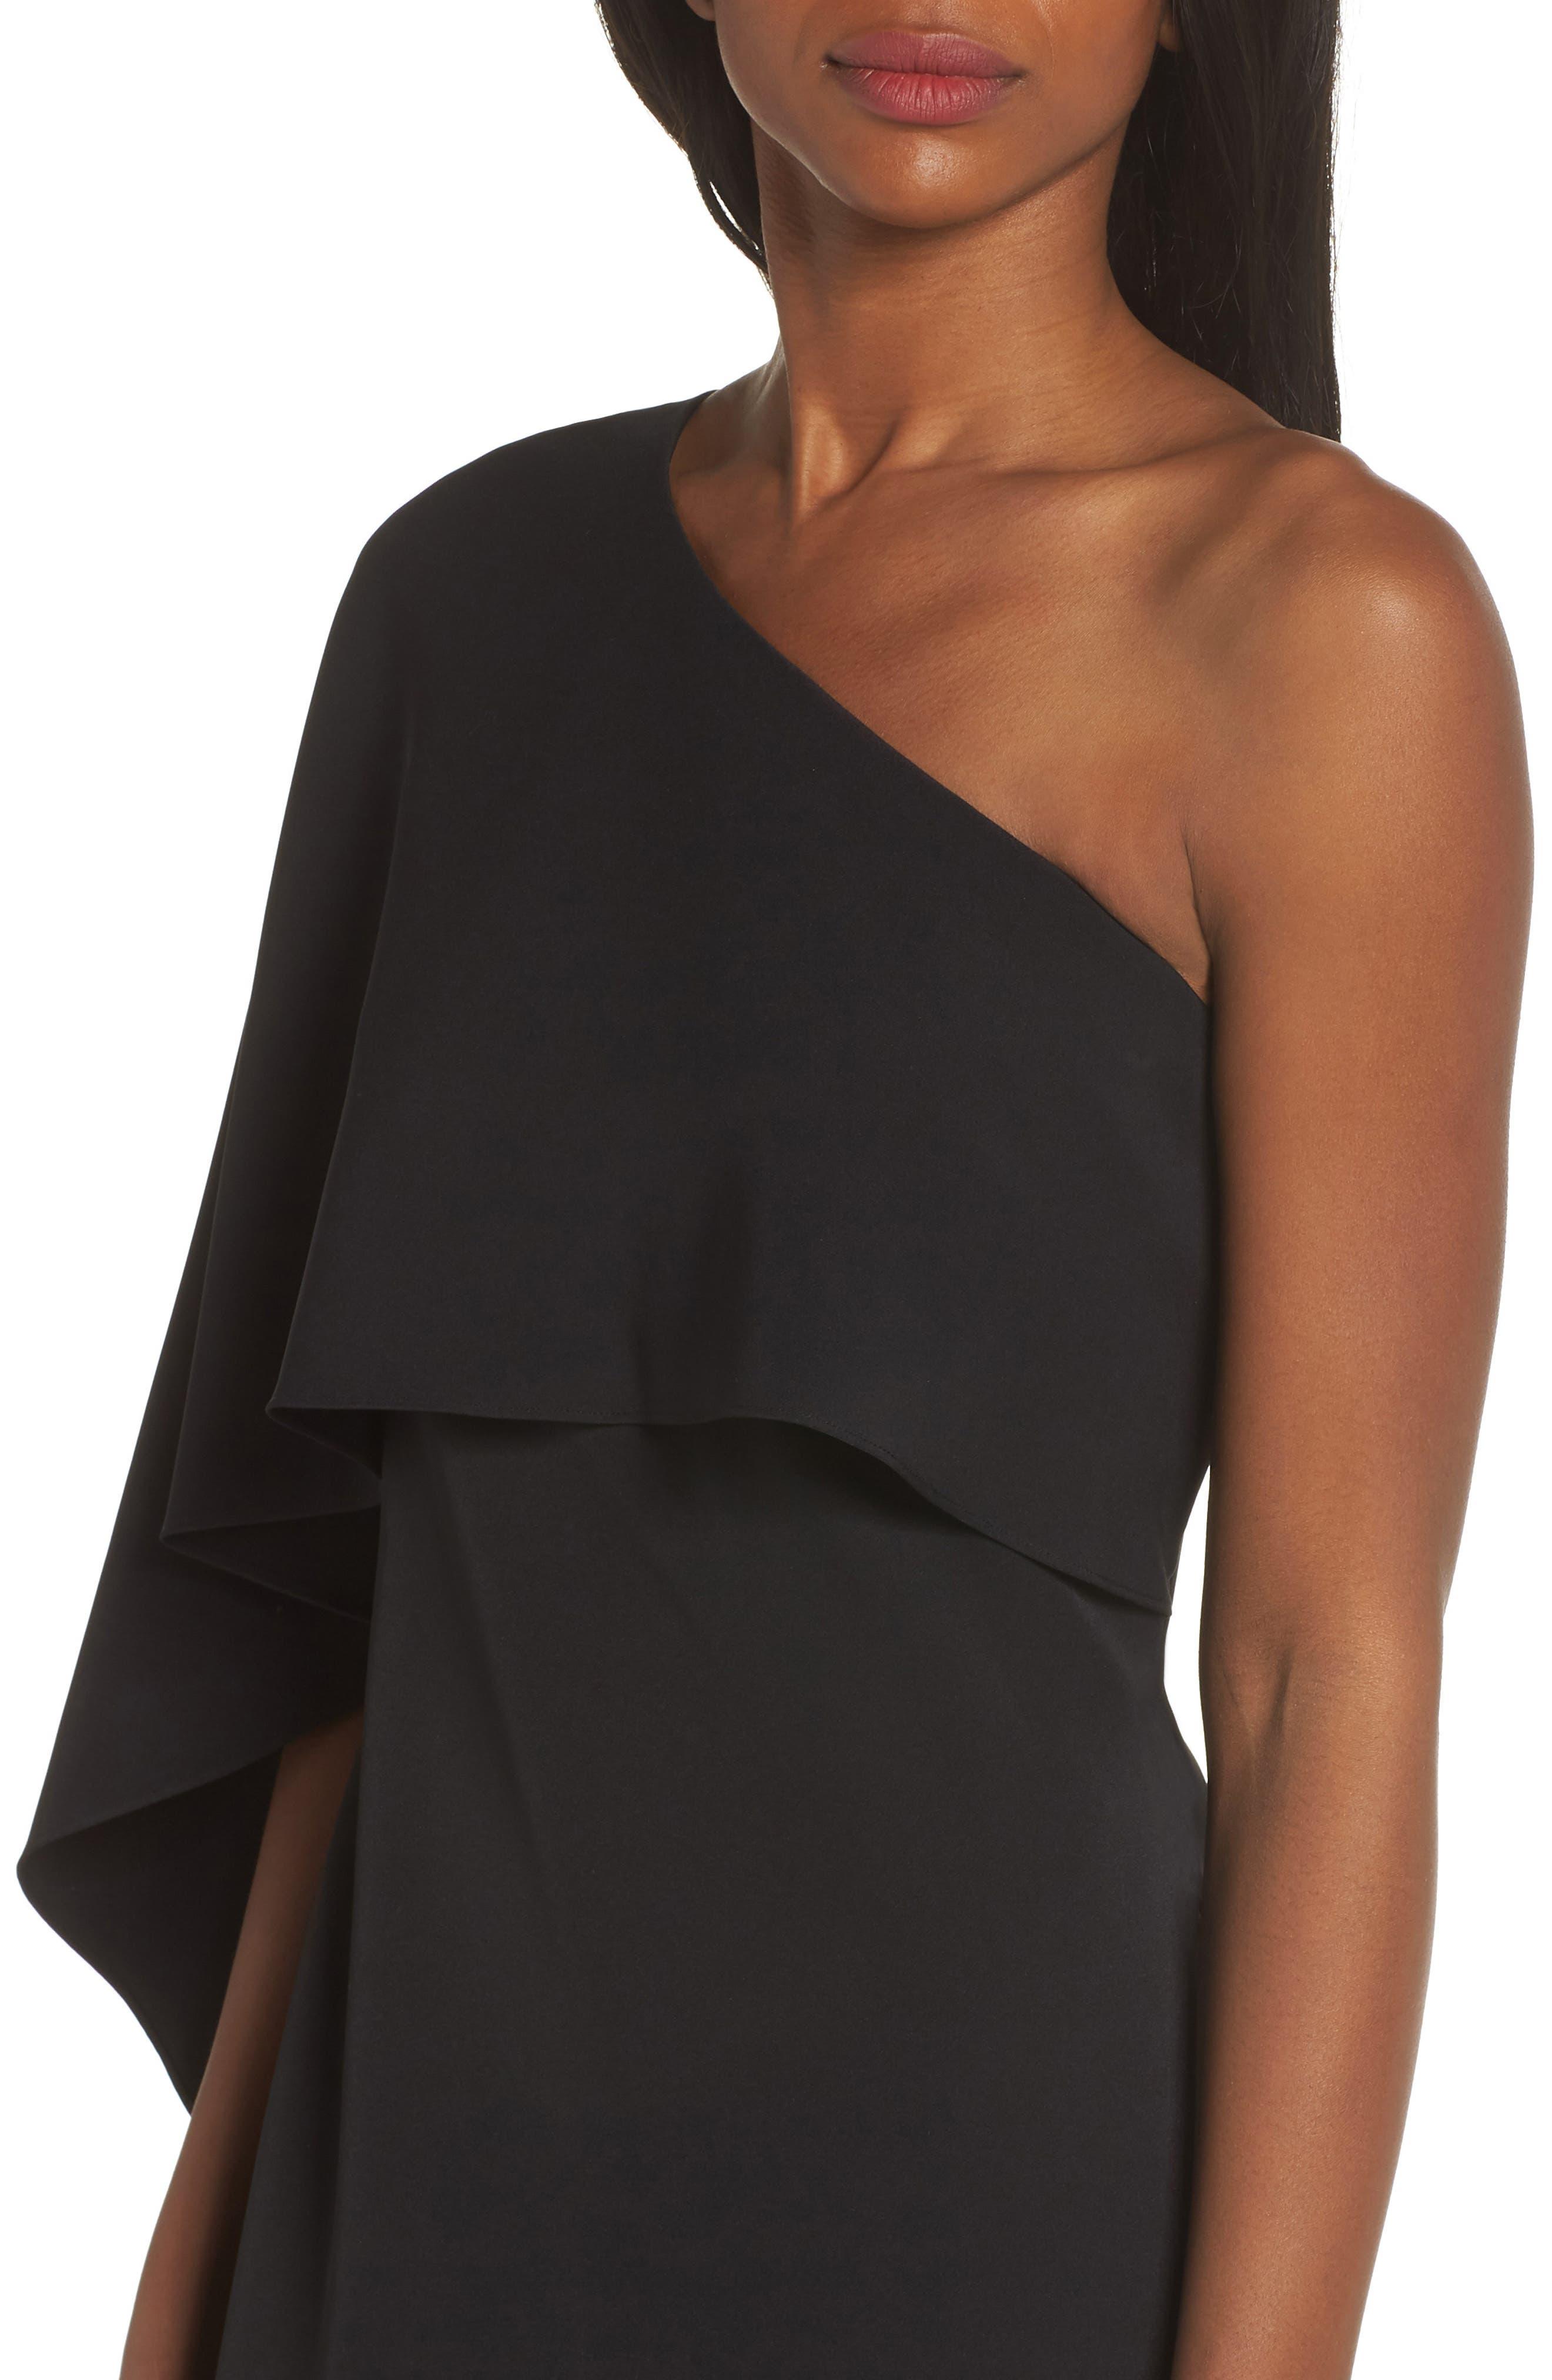 VINCE CAMUTO, One-Shoulder Cape Evening Dress, Alternate thumbnail 5, color, BLACK